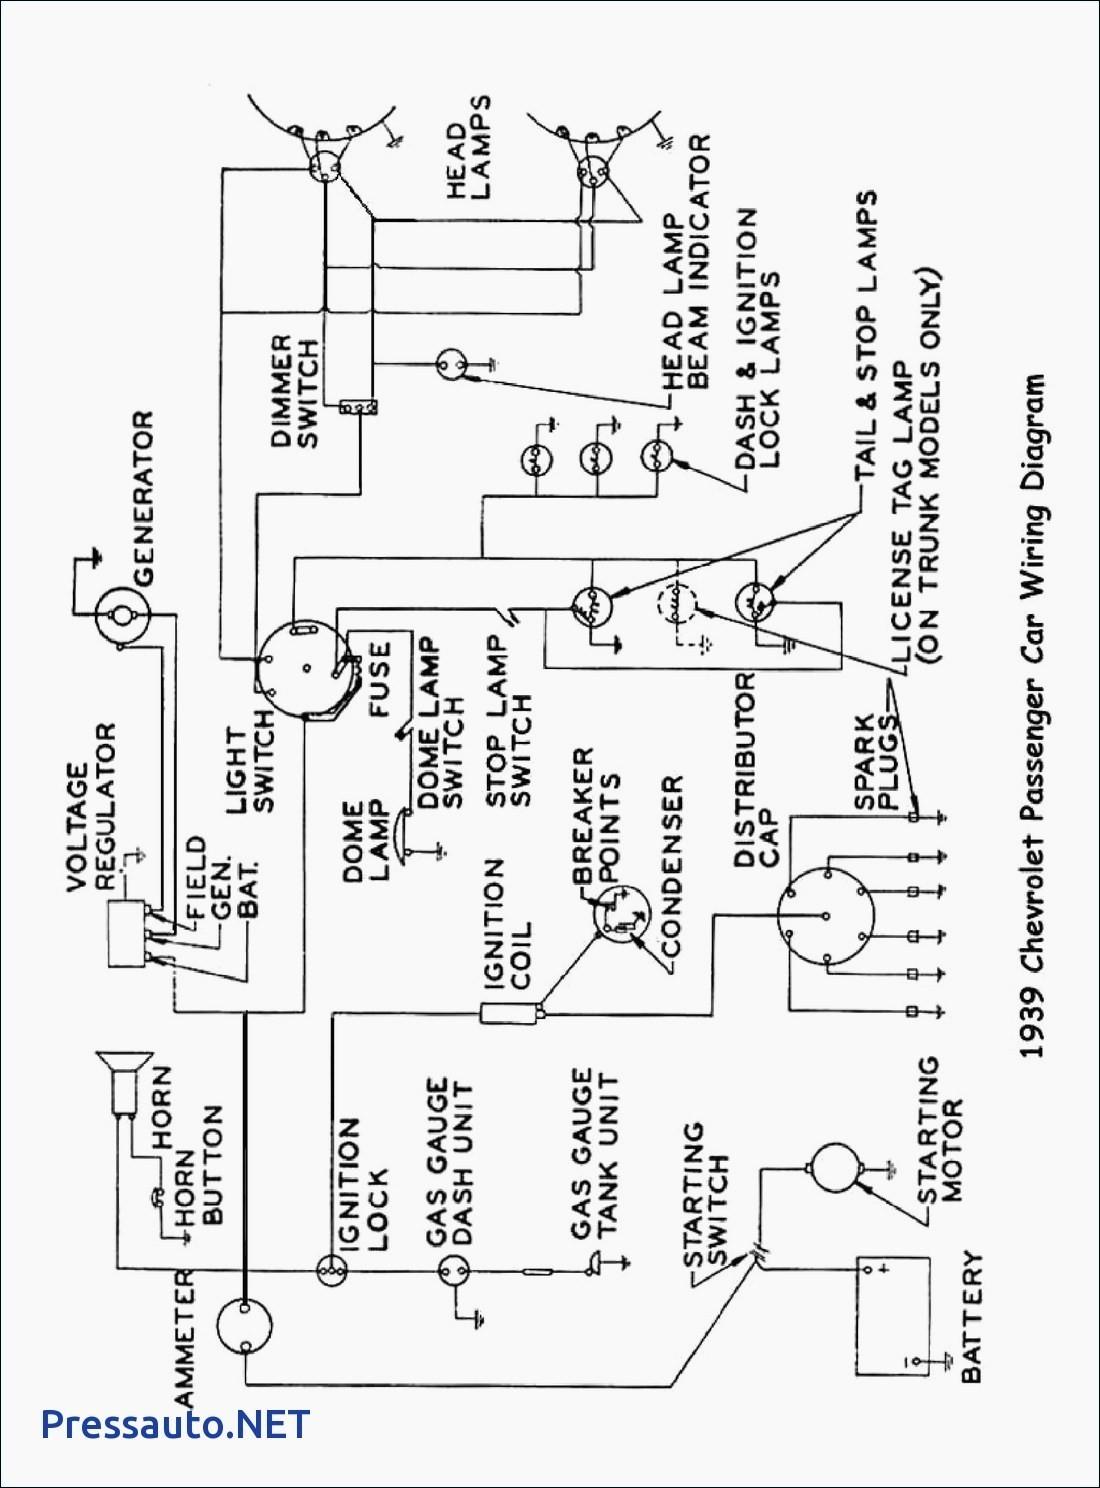 John Deere Cab Wiring Diagram